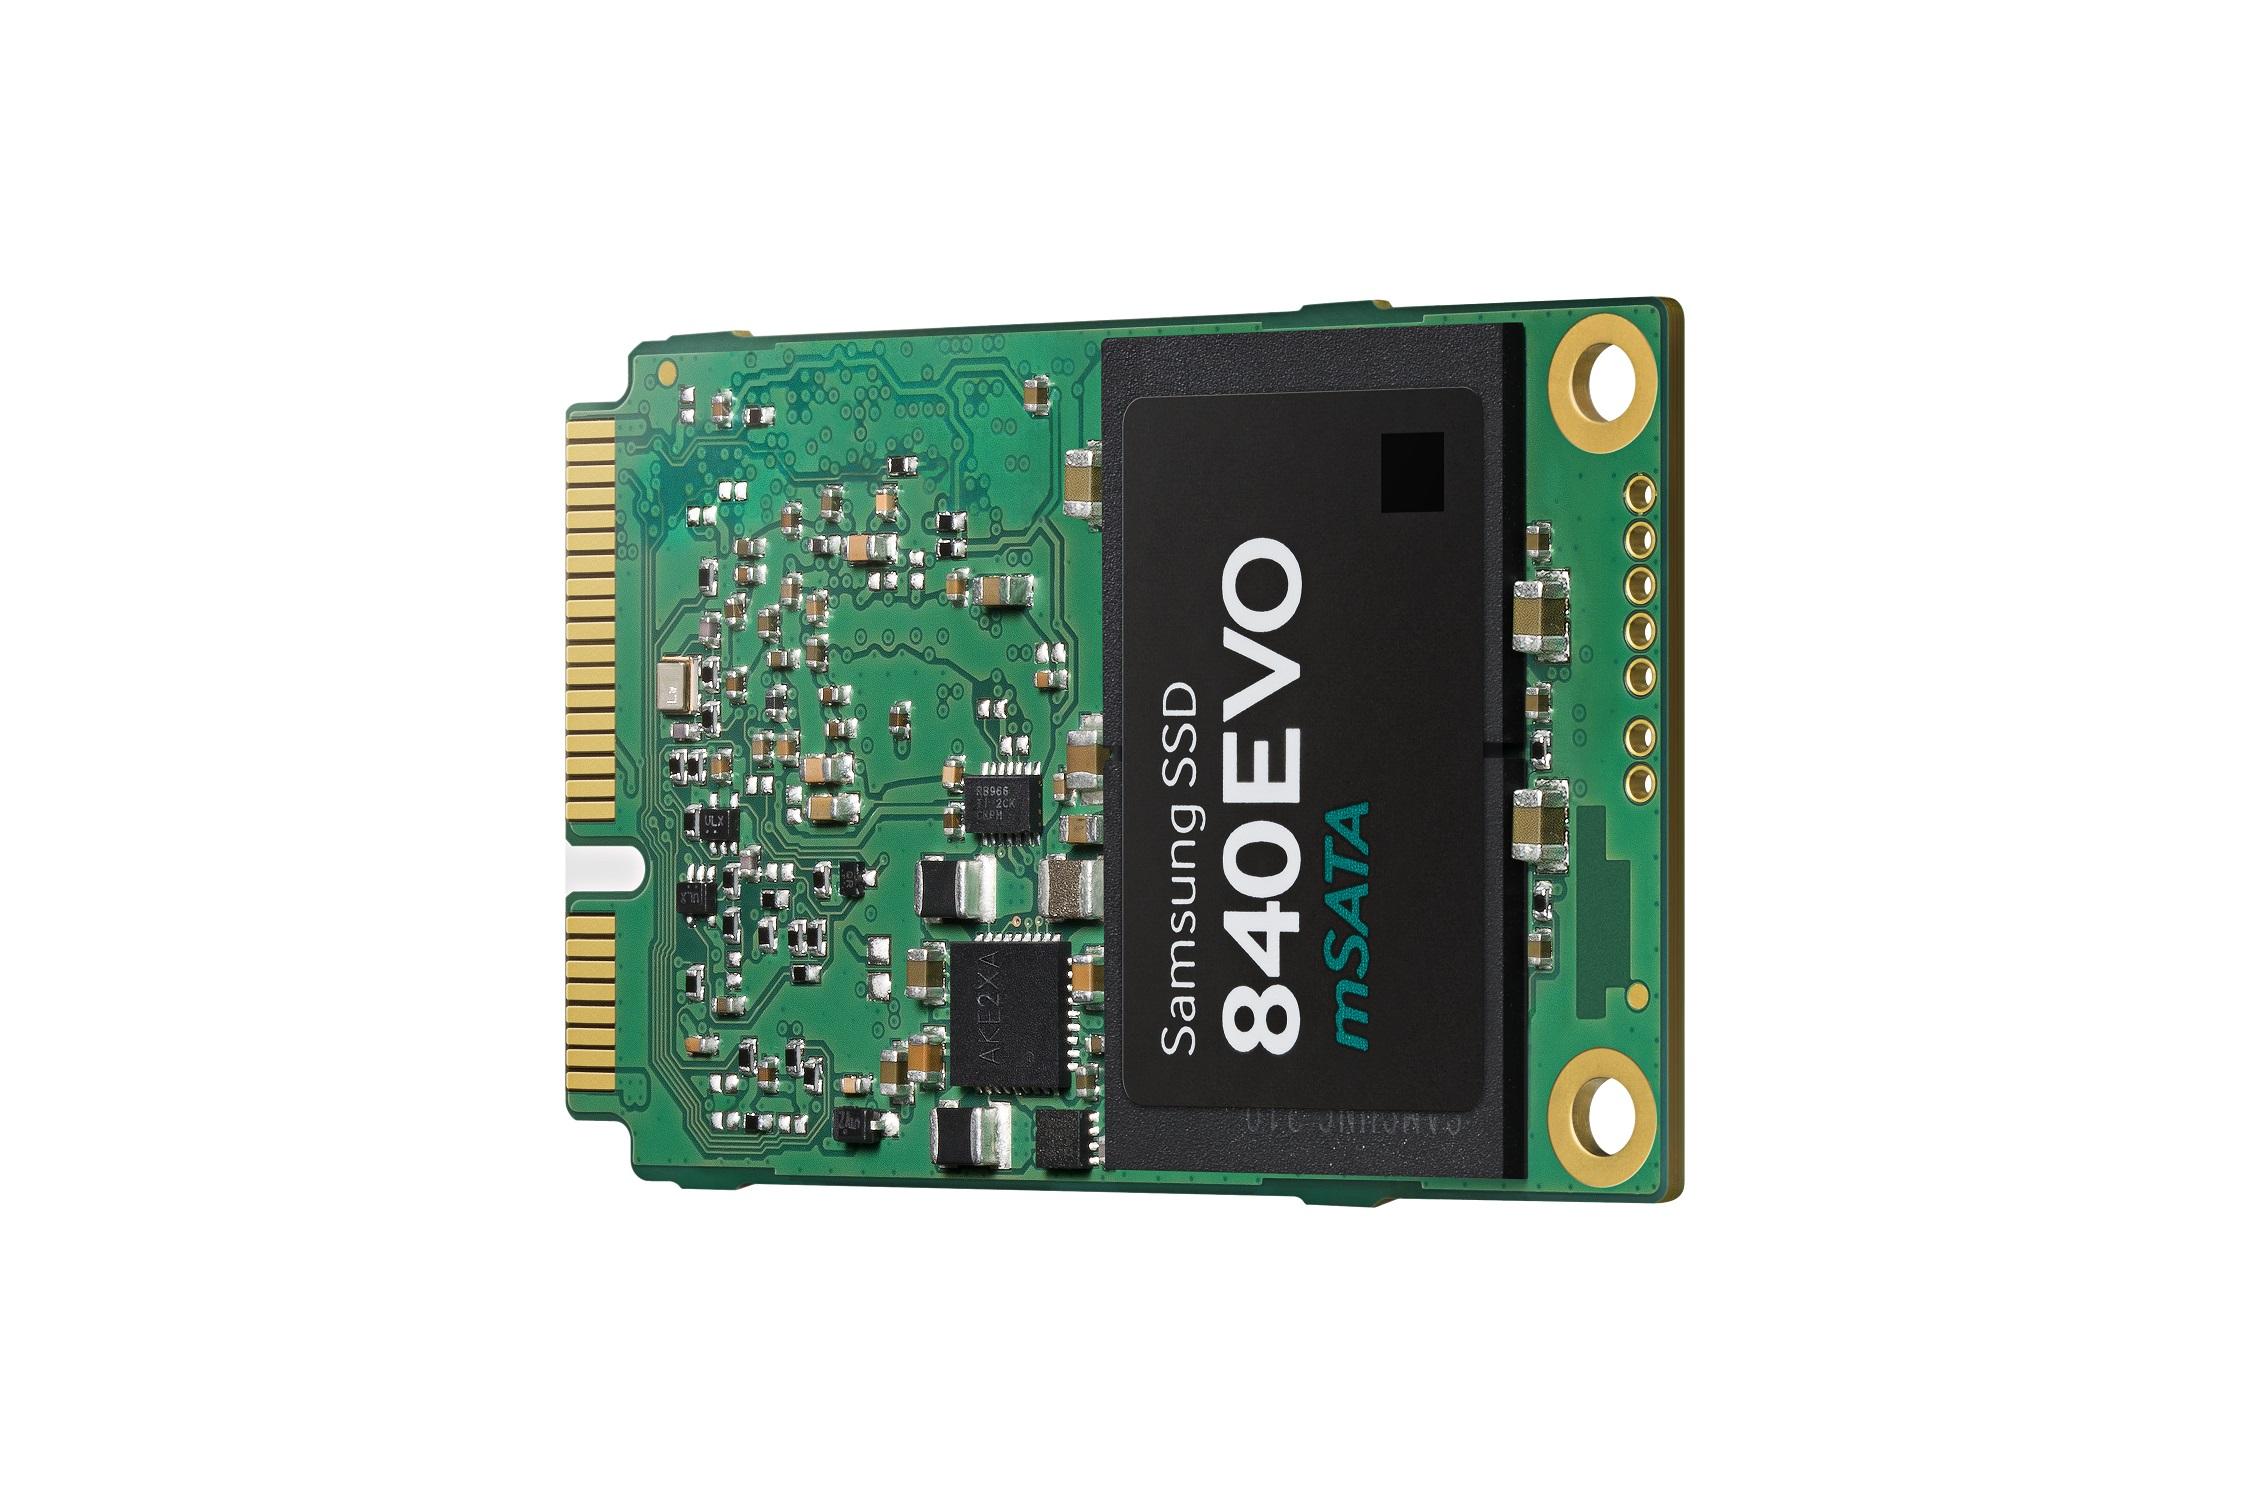 SSD-840-EVO-mSATA-2_004_Back-R-Perspective_Green.jpg